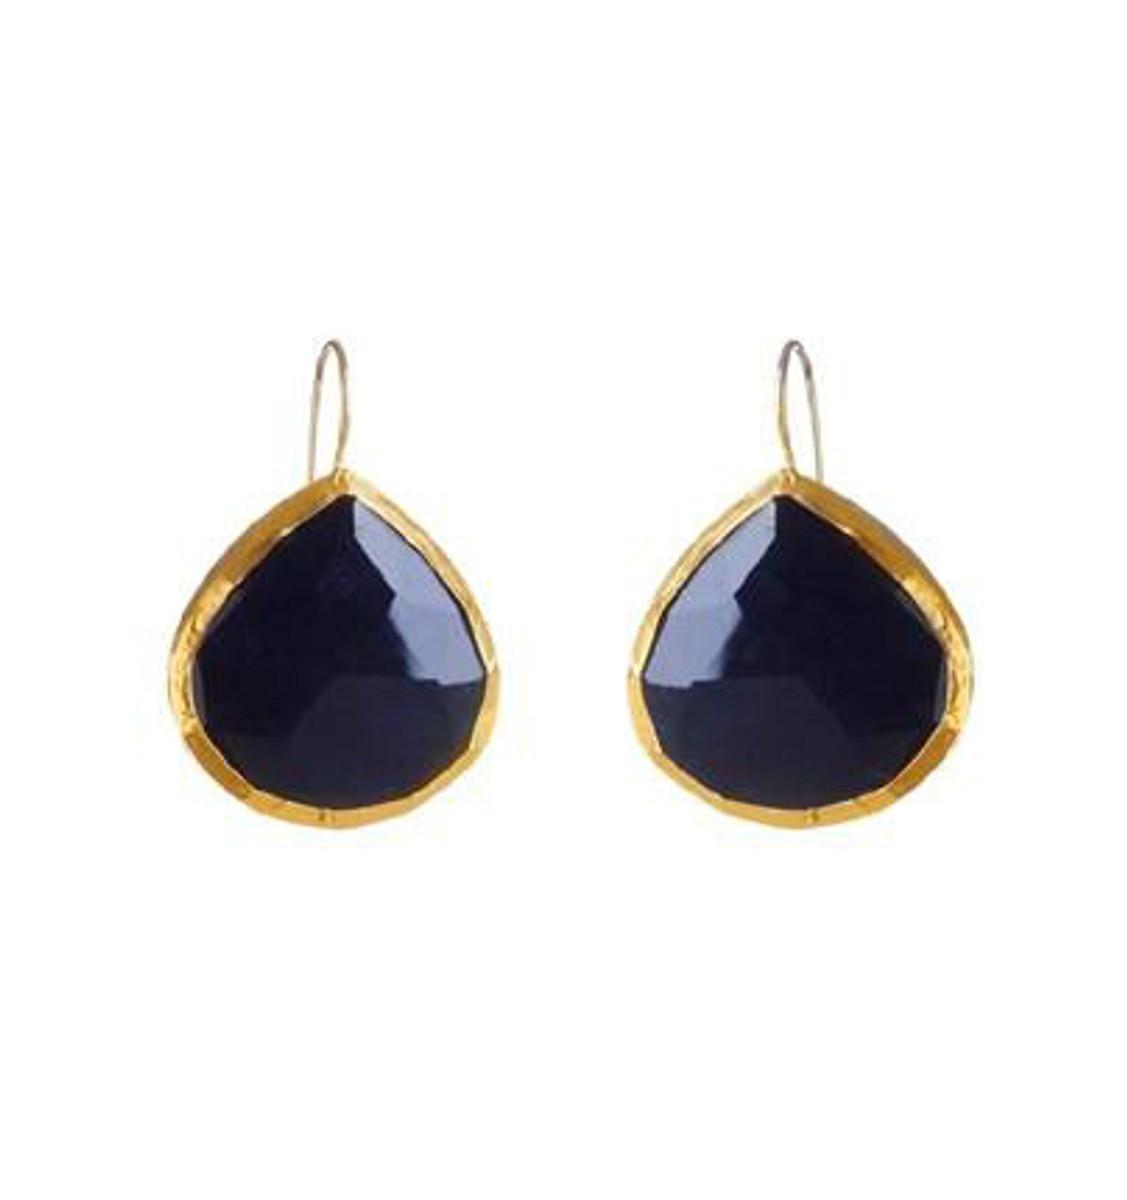 Black Night Earrings by Nava Zahavi - New Arrival